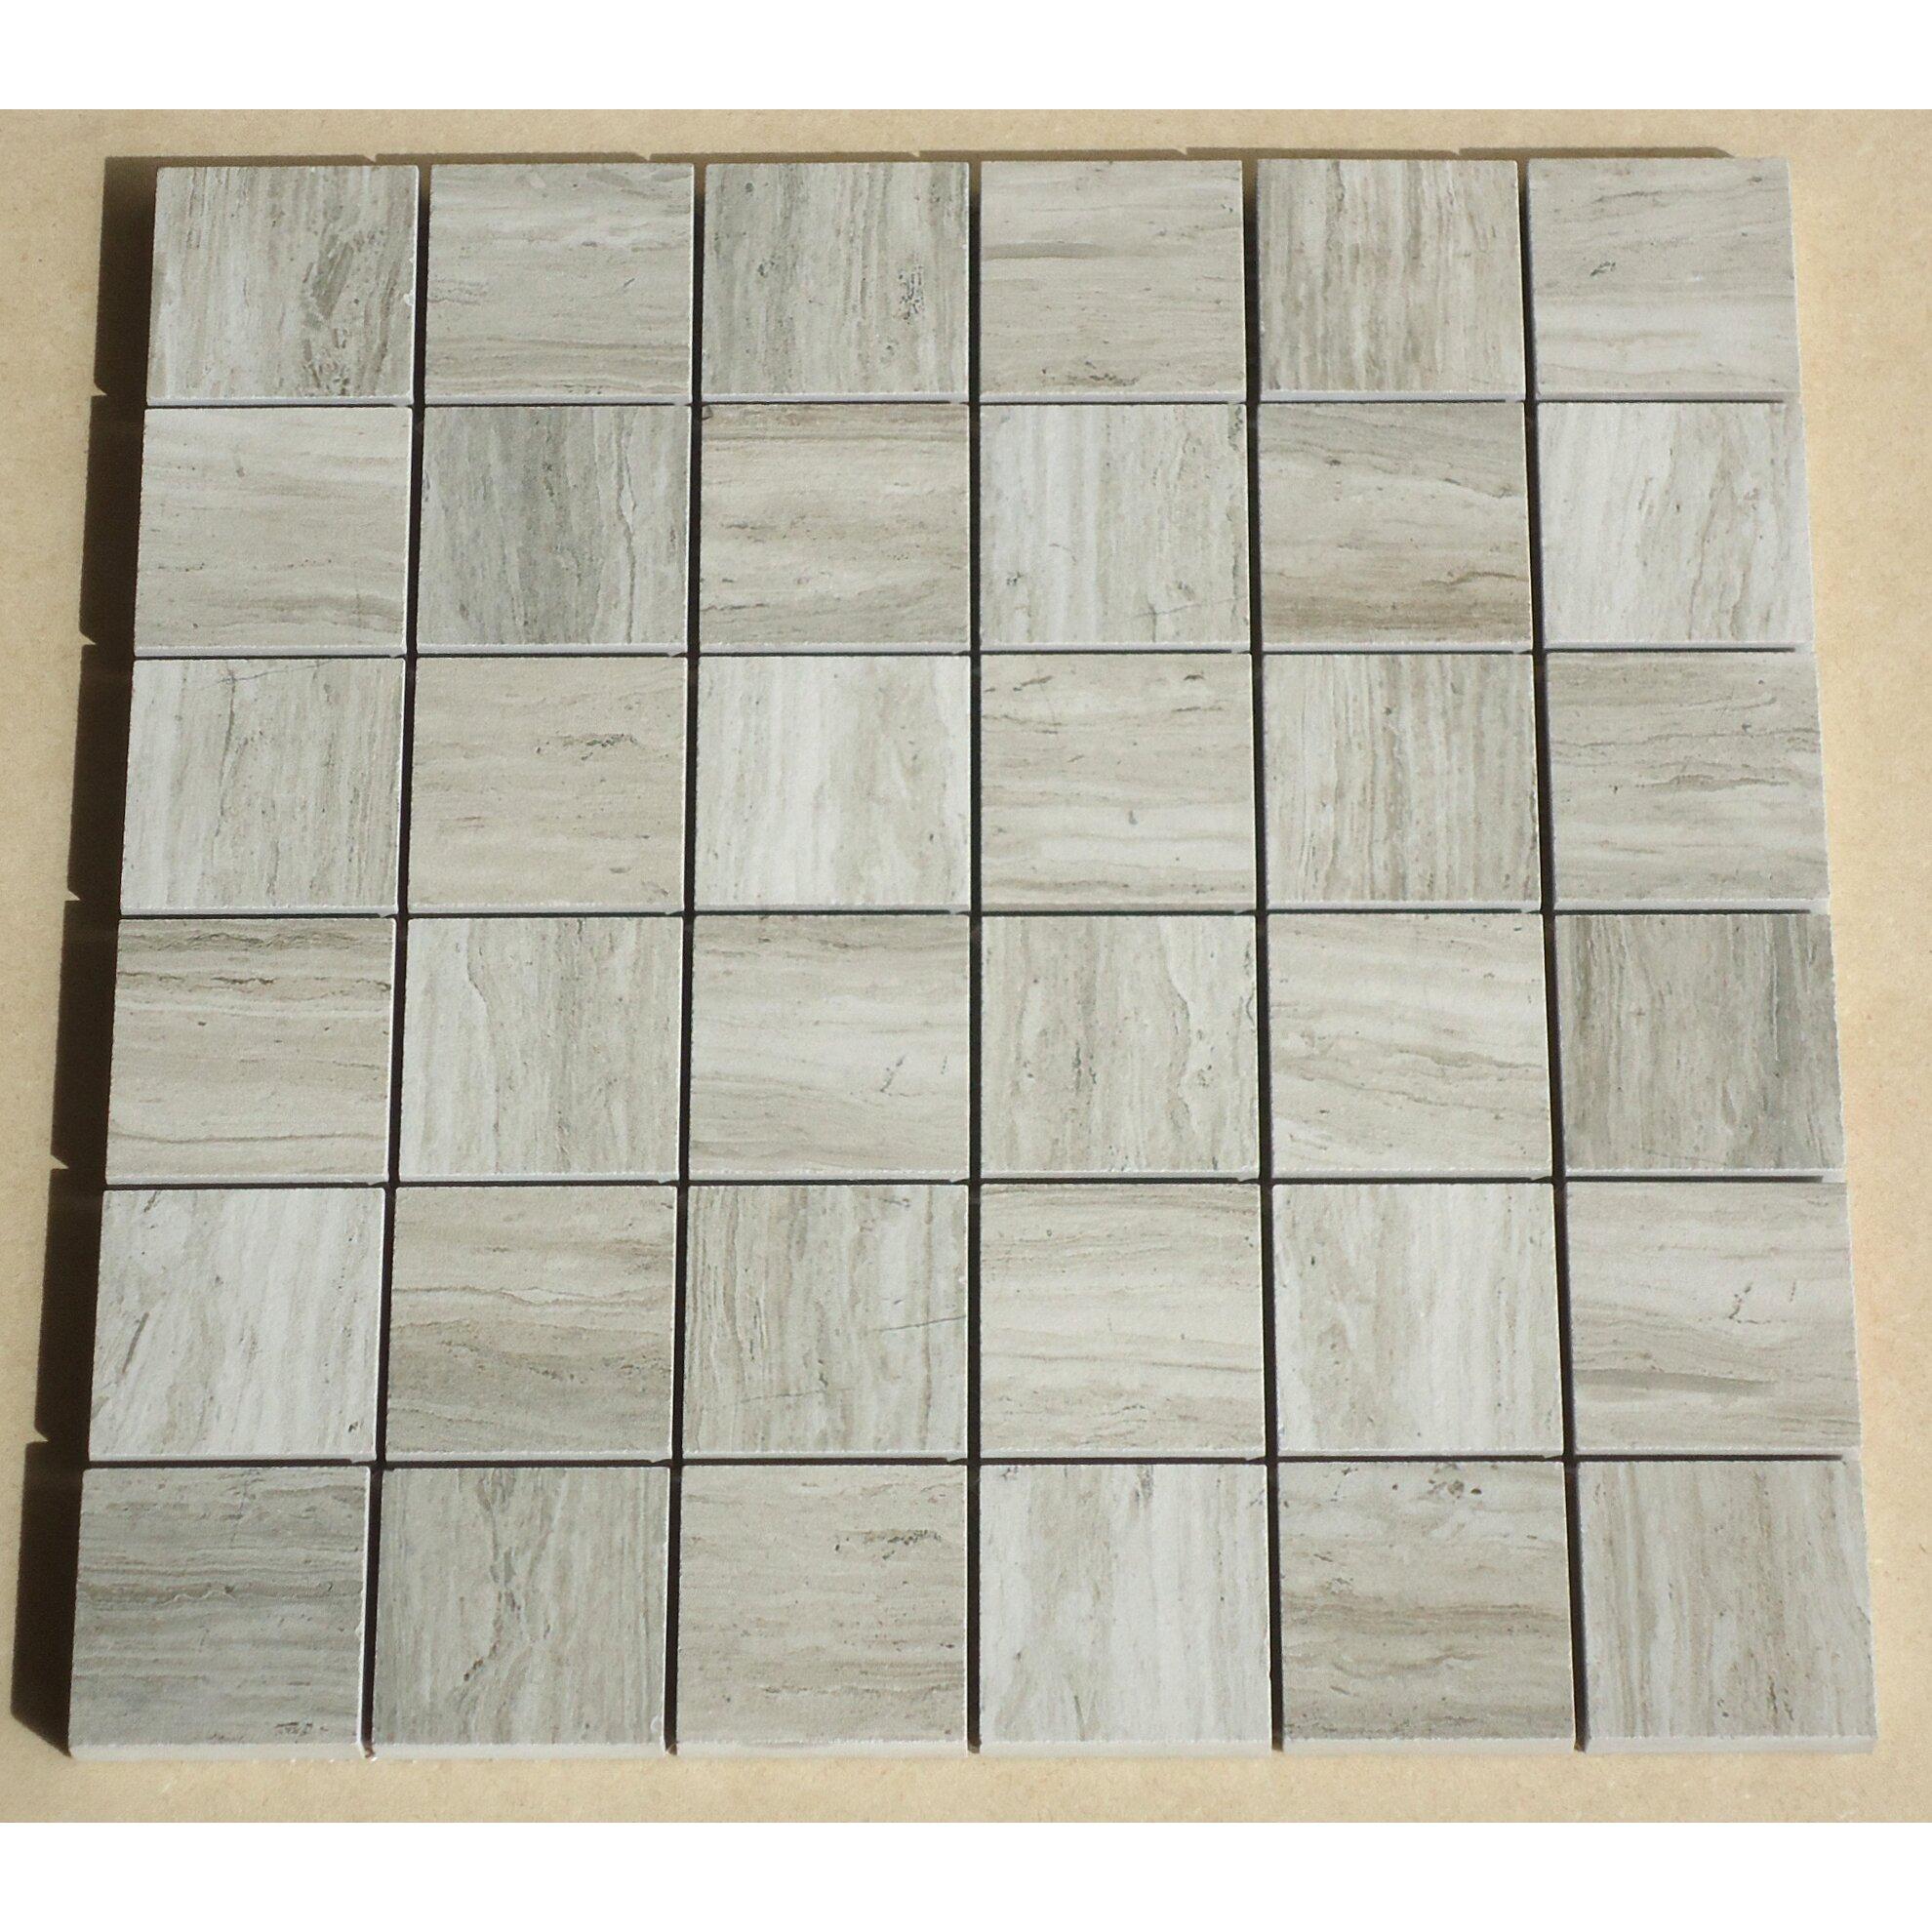 Mulia Ceramic Tile Gallery - modern tile texture seamless